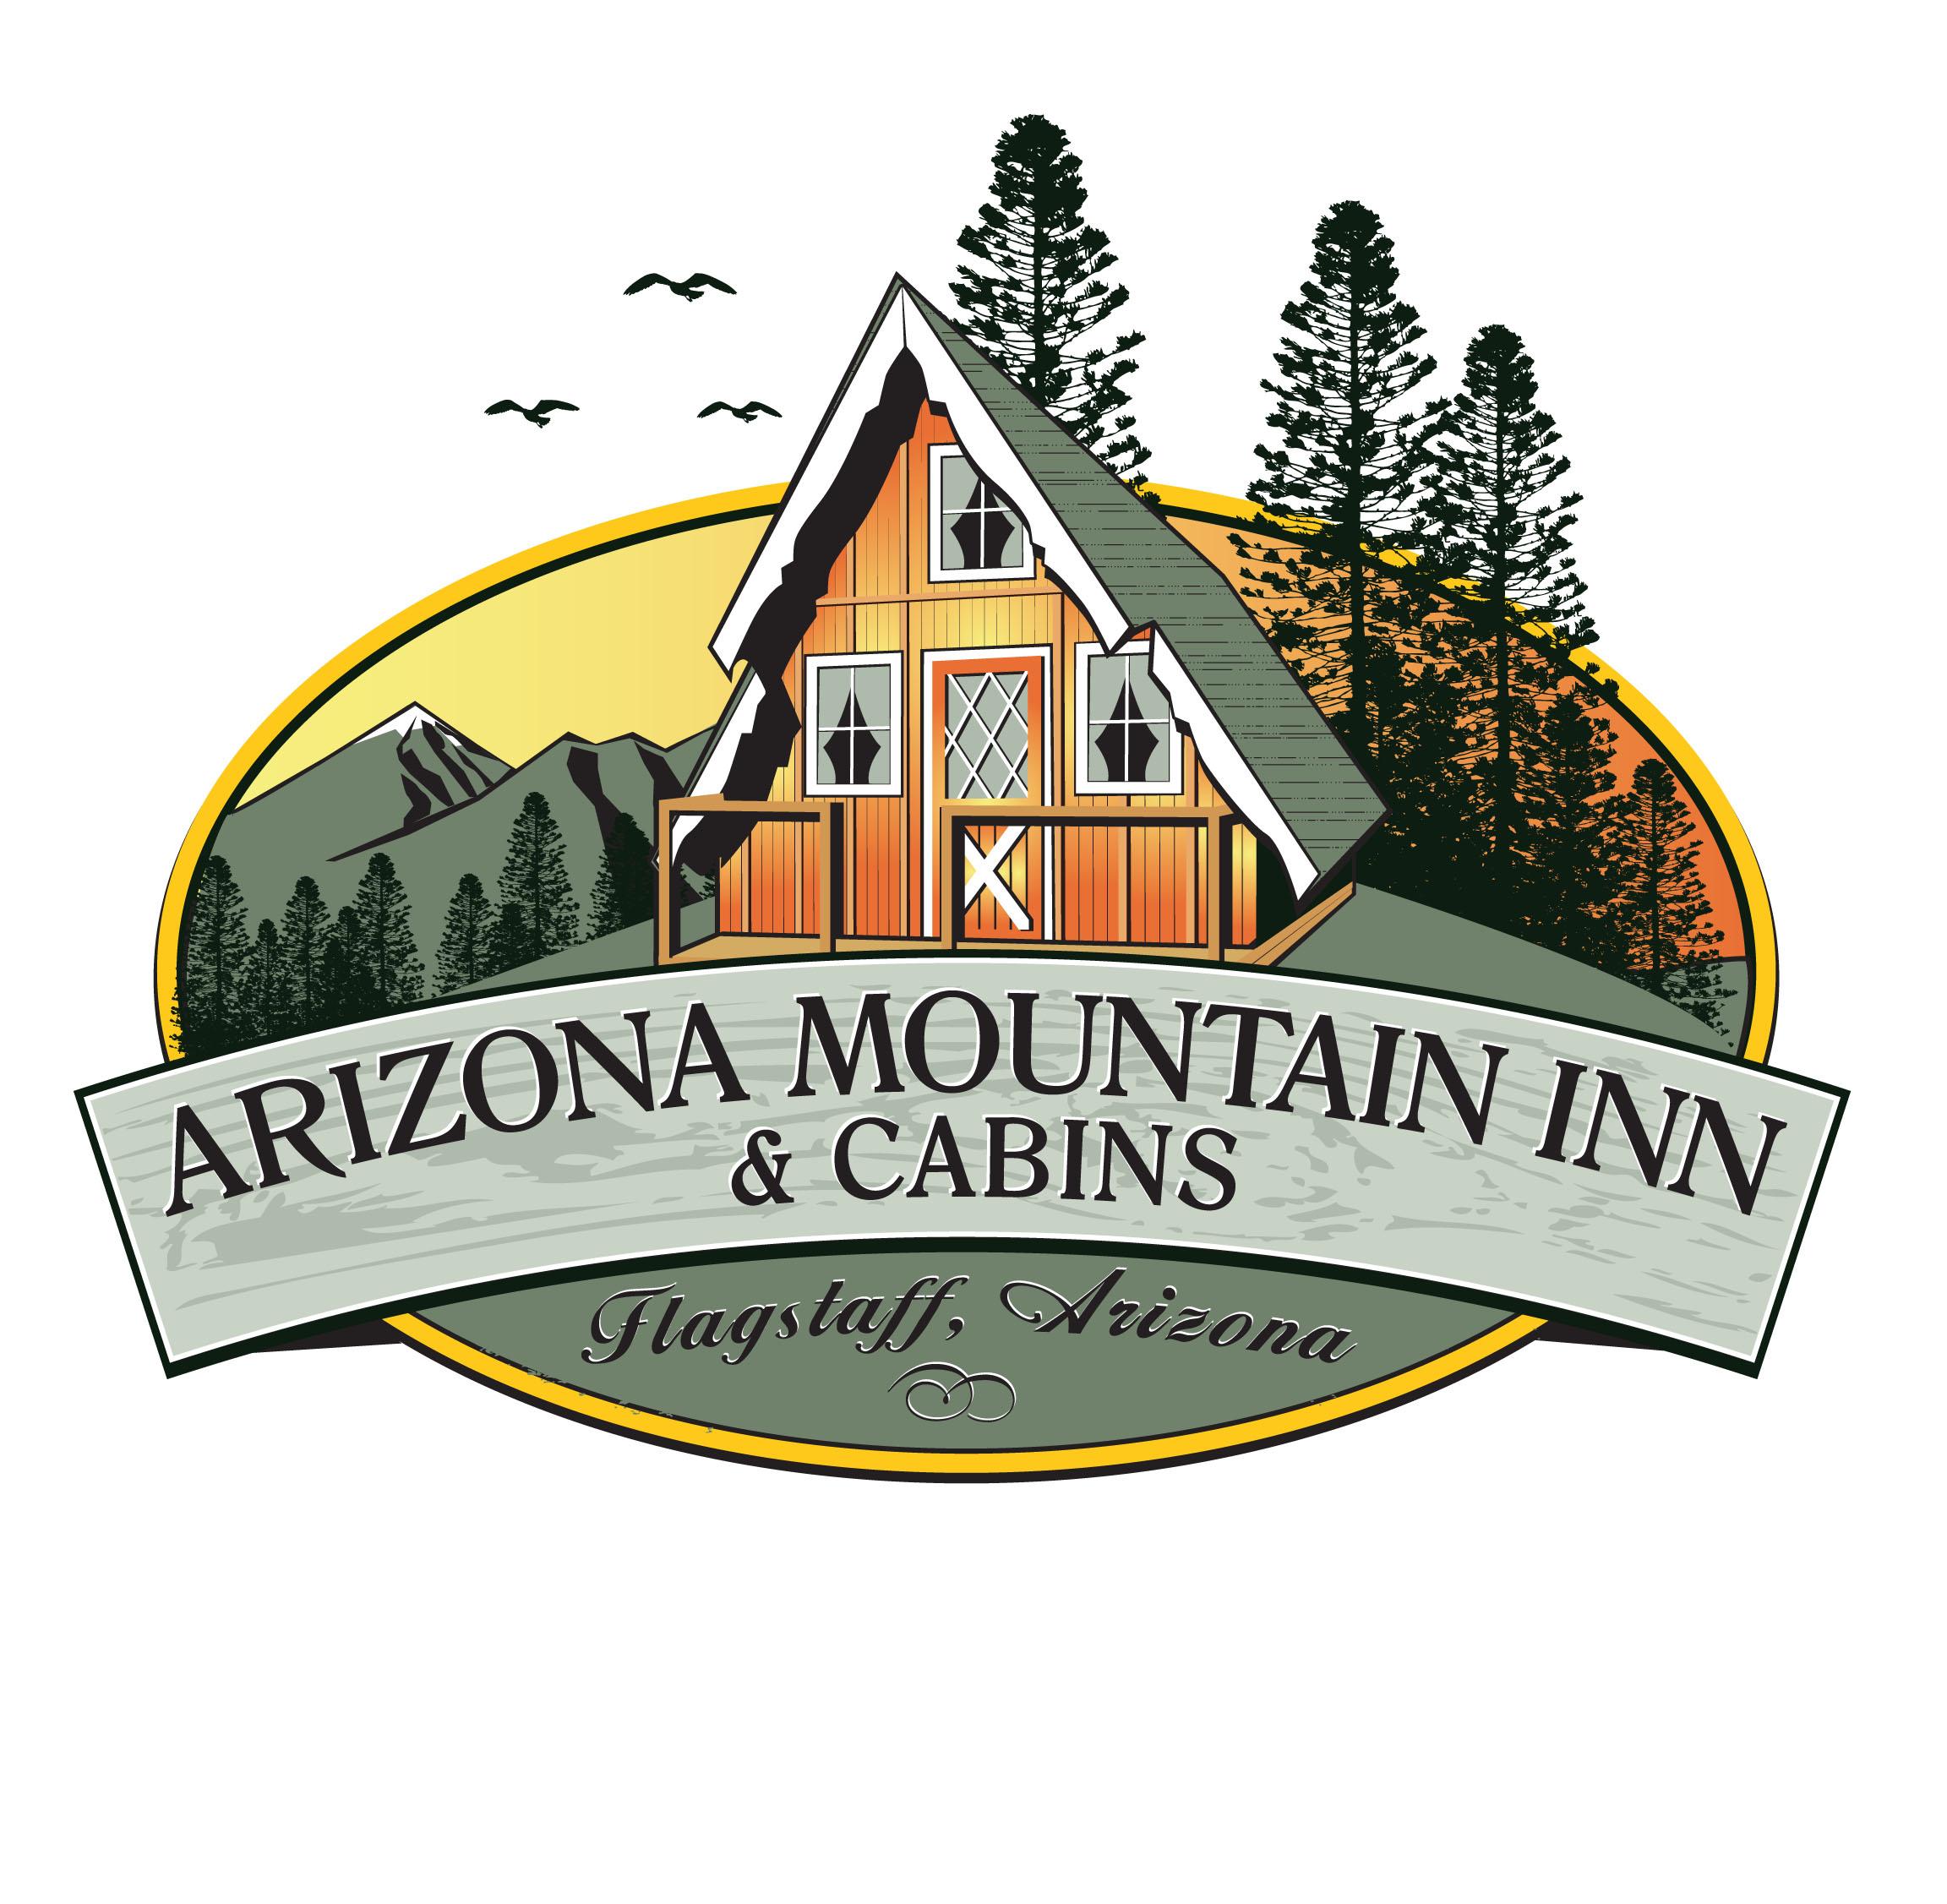 Cabin clipart inn. Picturesque rental arizona mountain